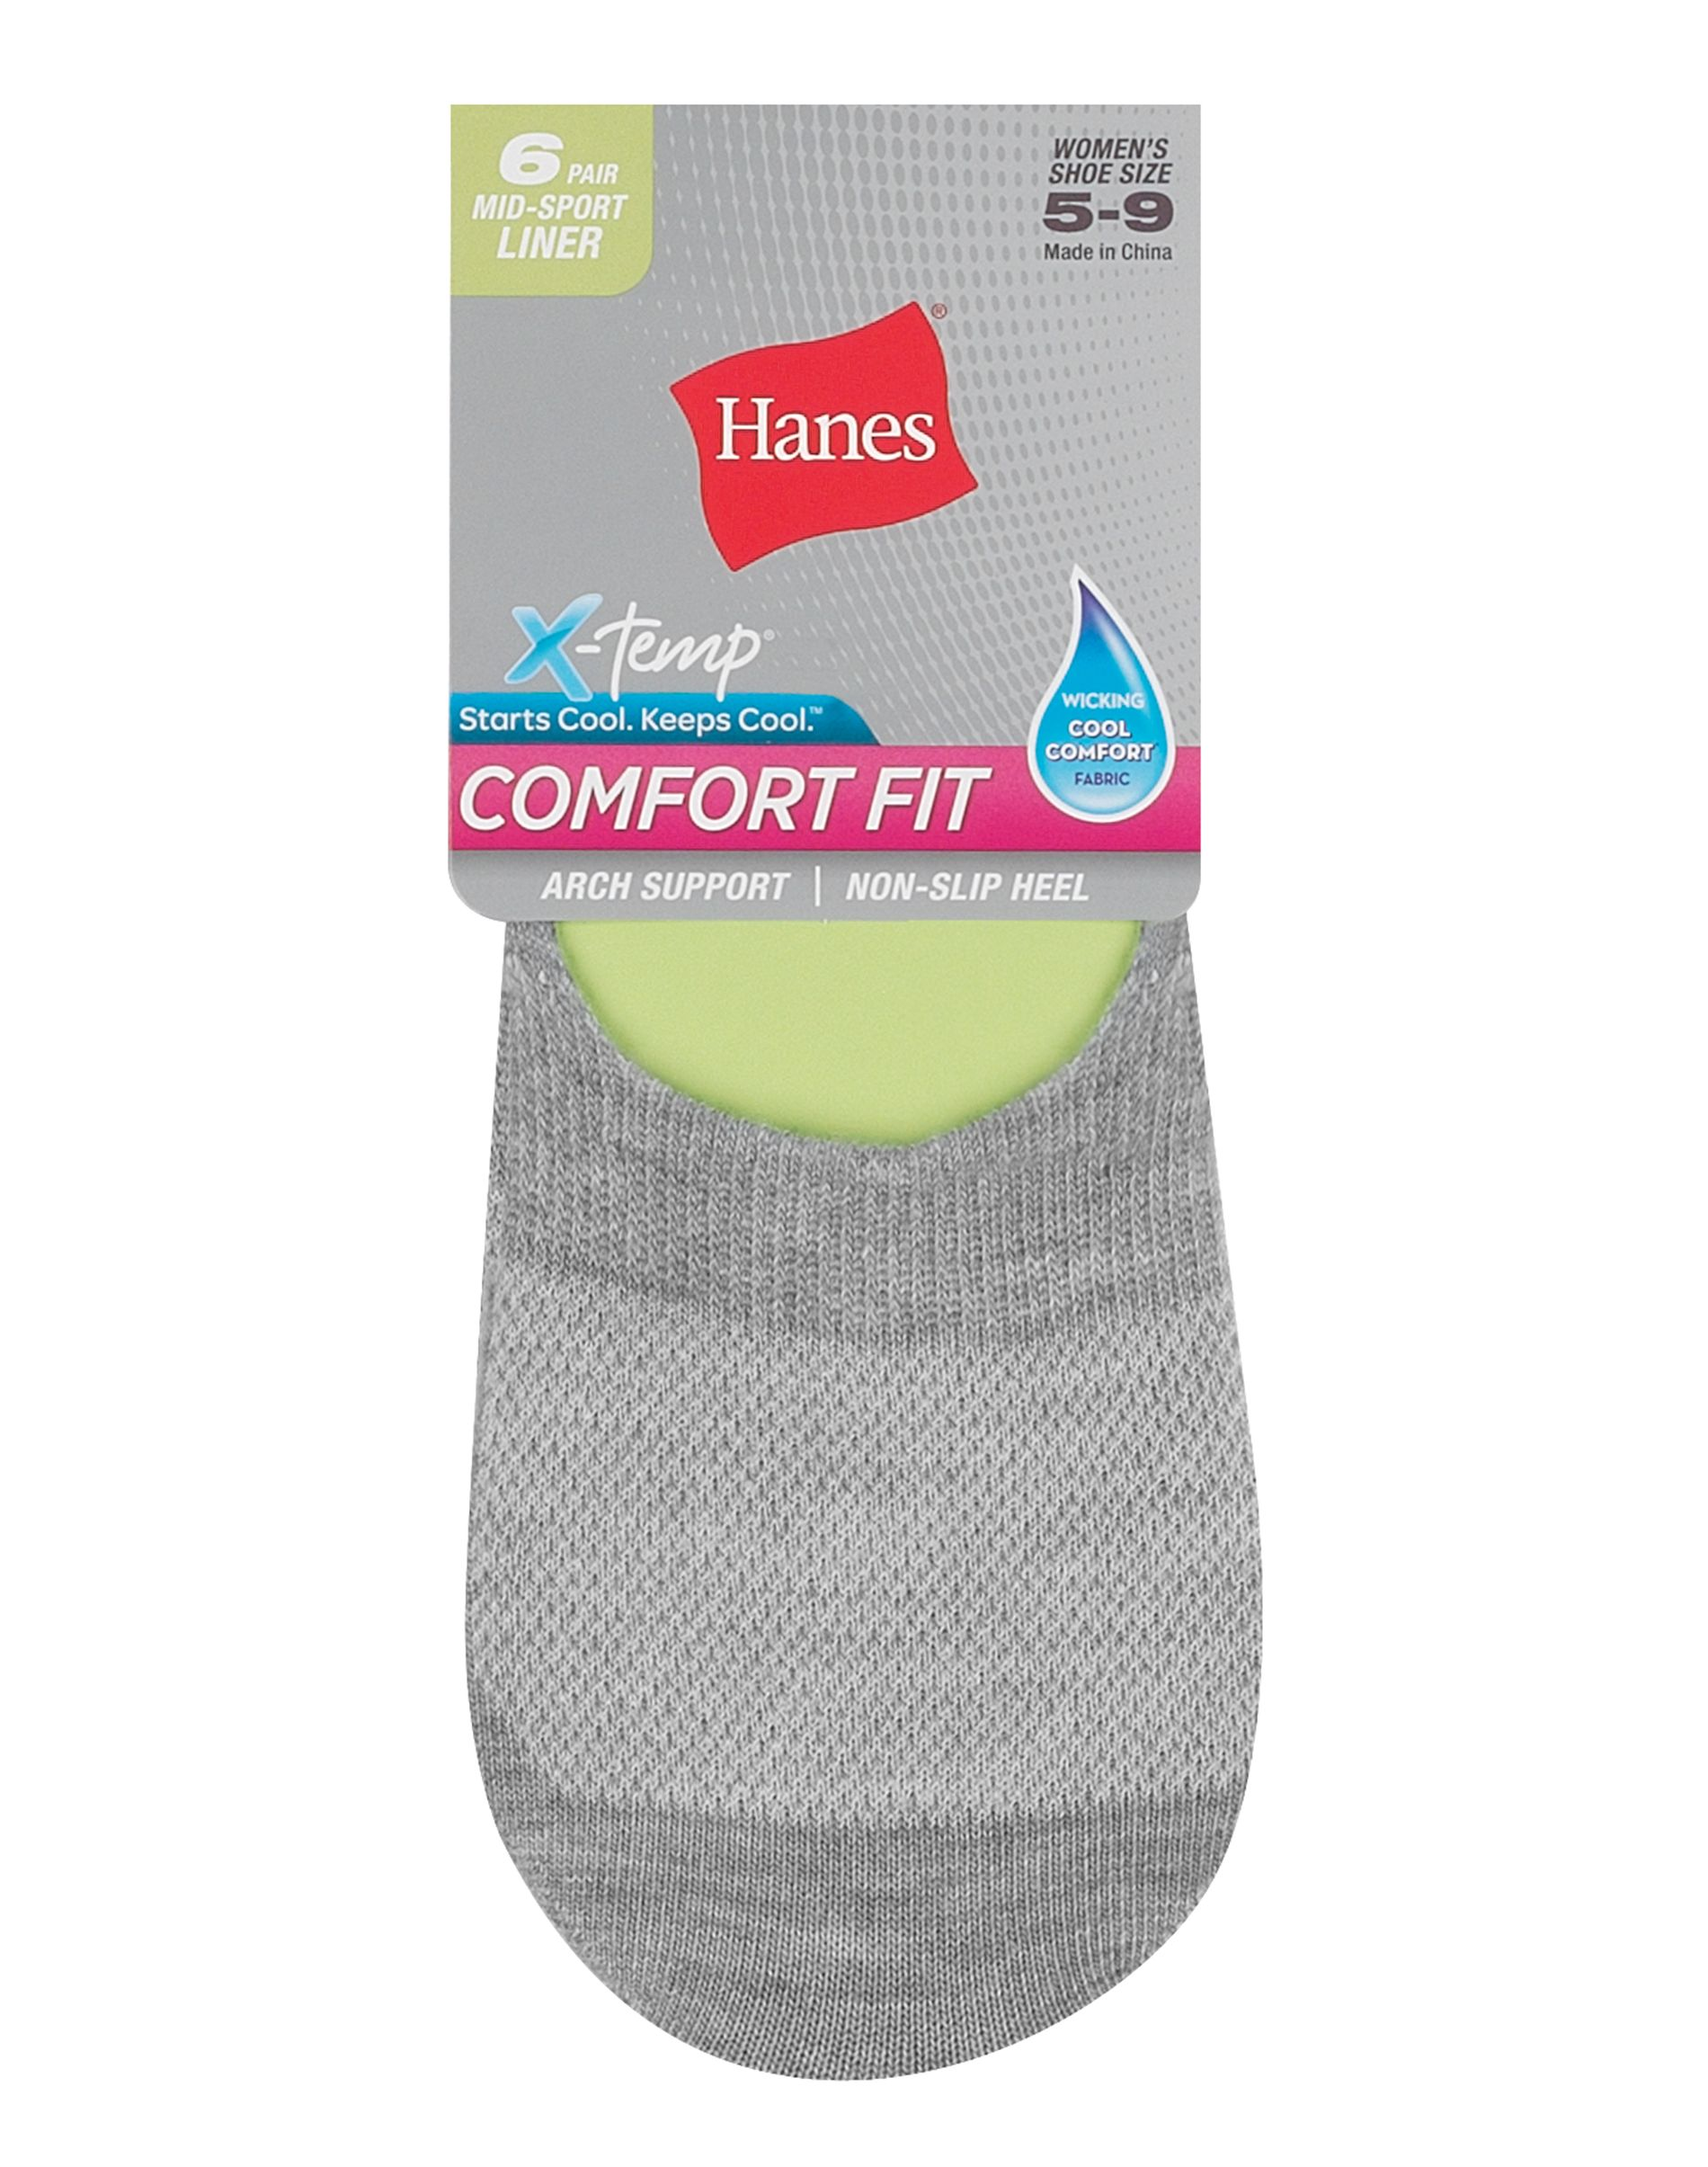 hanes women's comfort fit invisible liner: mid sport, 6-pack women Hanes